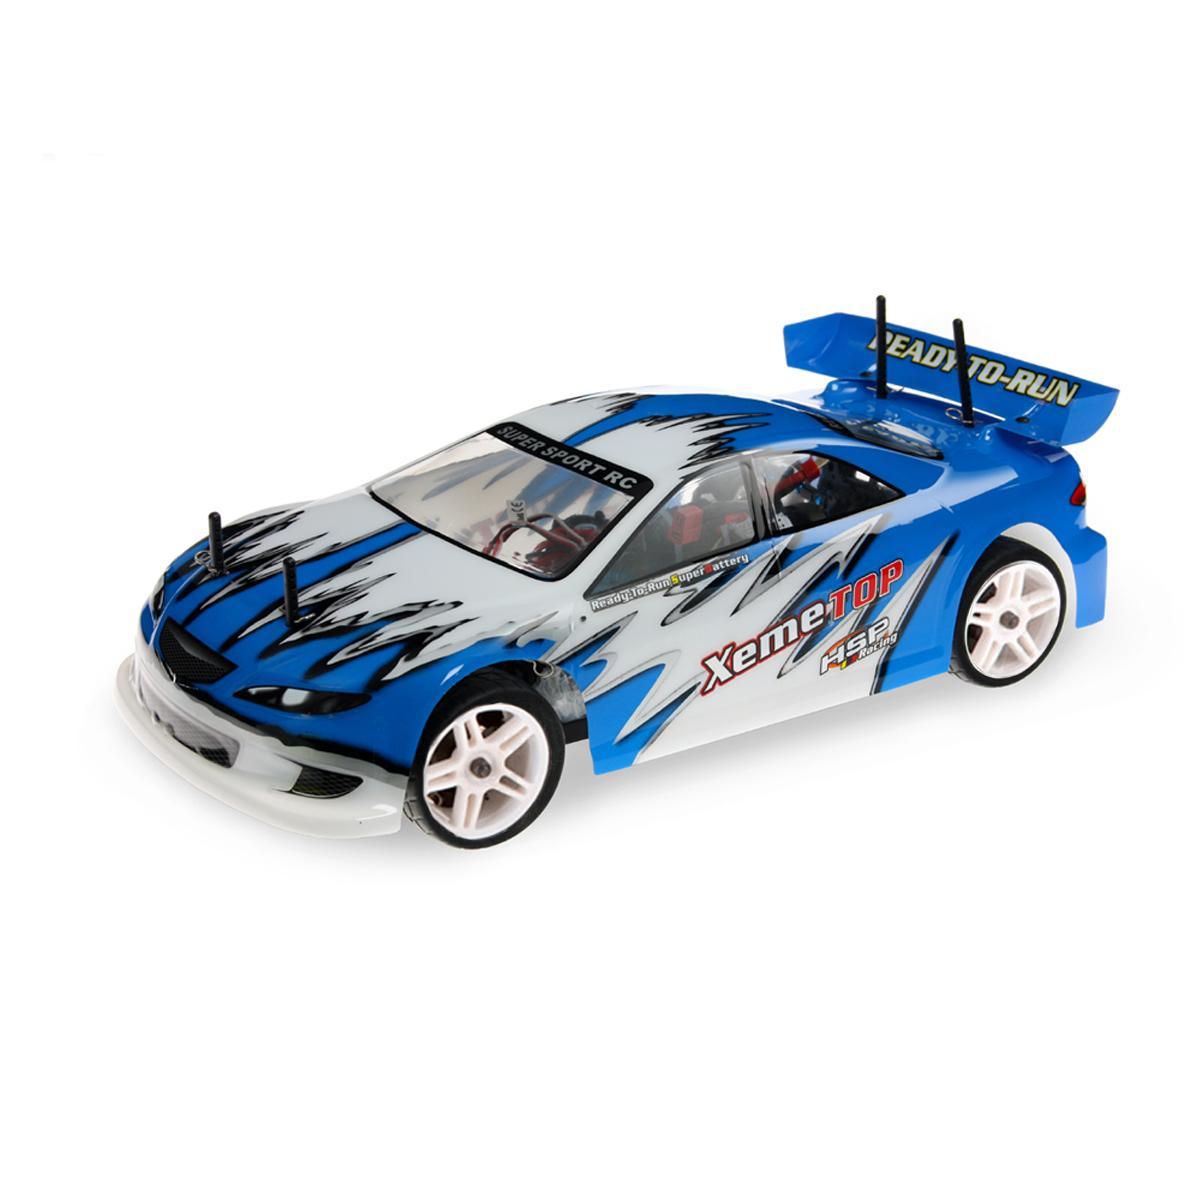 94103 Xeme Super Motive 1/10 Scale 4wd Racing Car 5